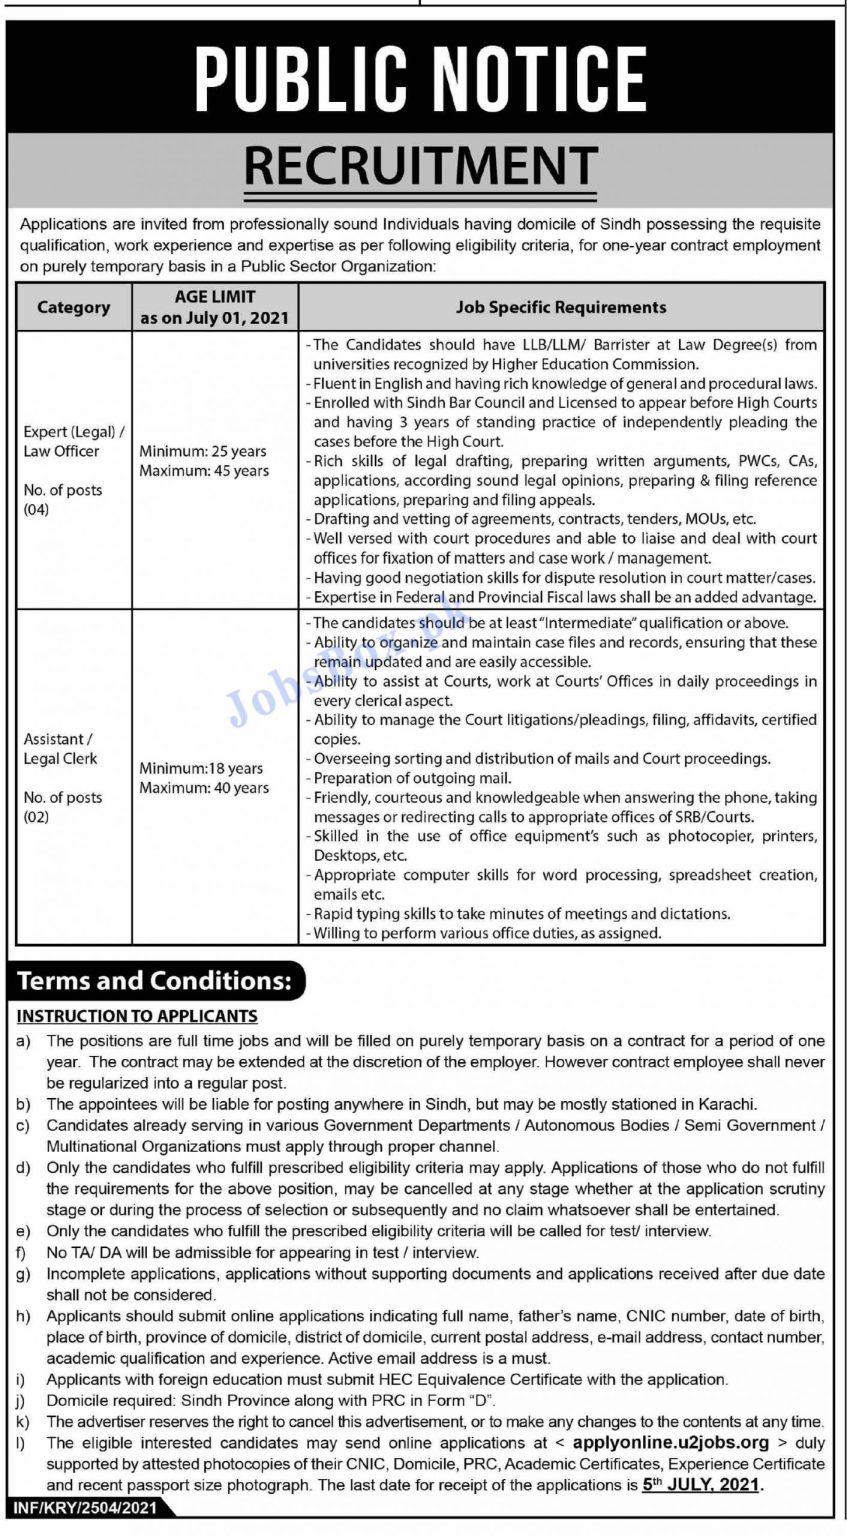 Public Sector Organization Karachi Jobs 2021 – Applyonline.u2jobs.org